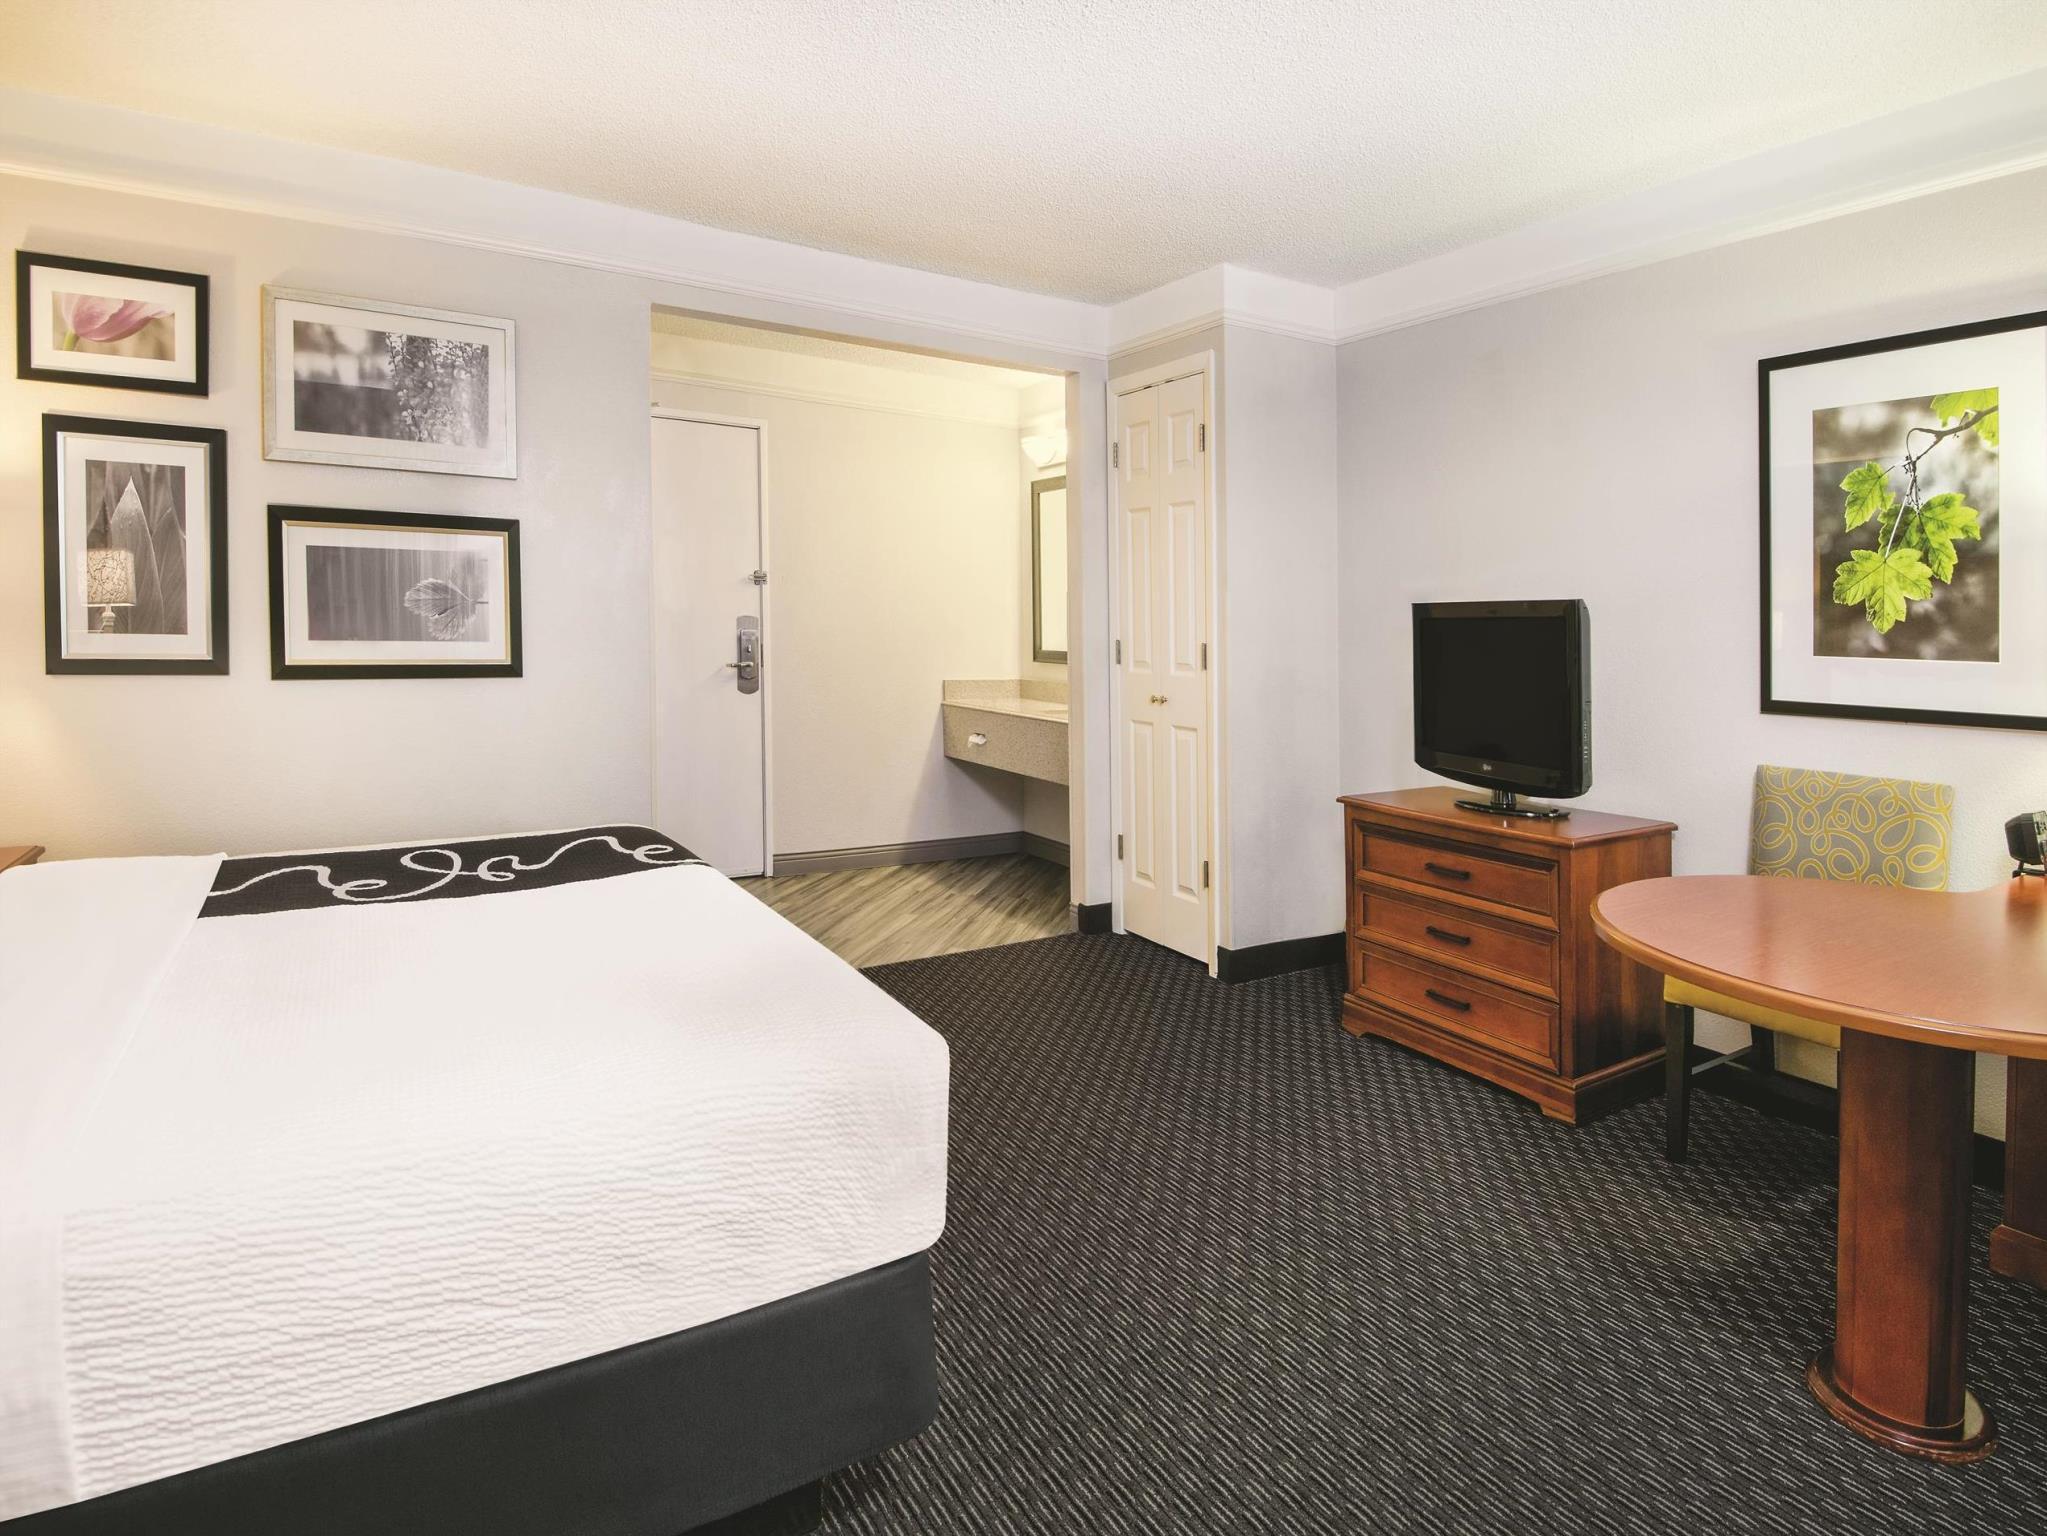 La Quinta Inn & Suites By Wyndham Houston Baytown East